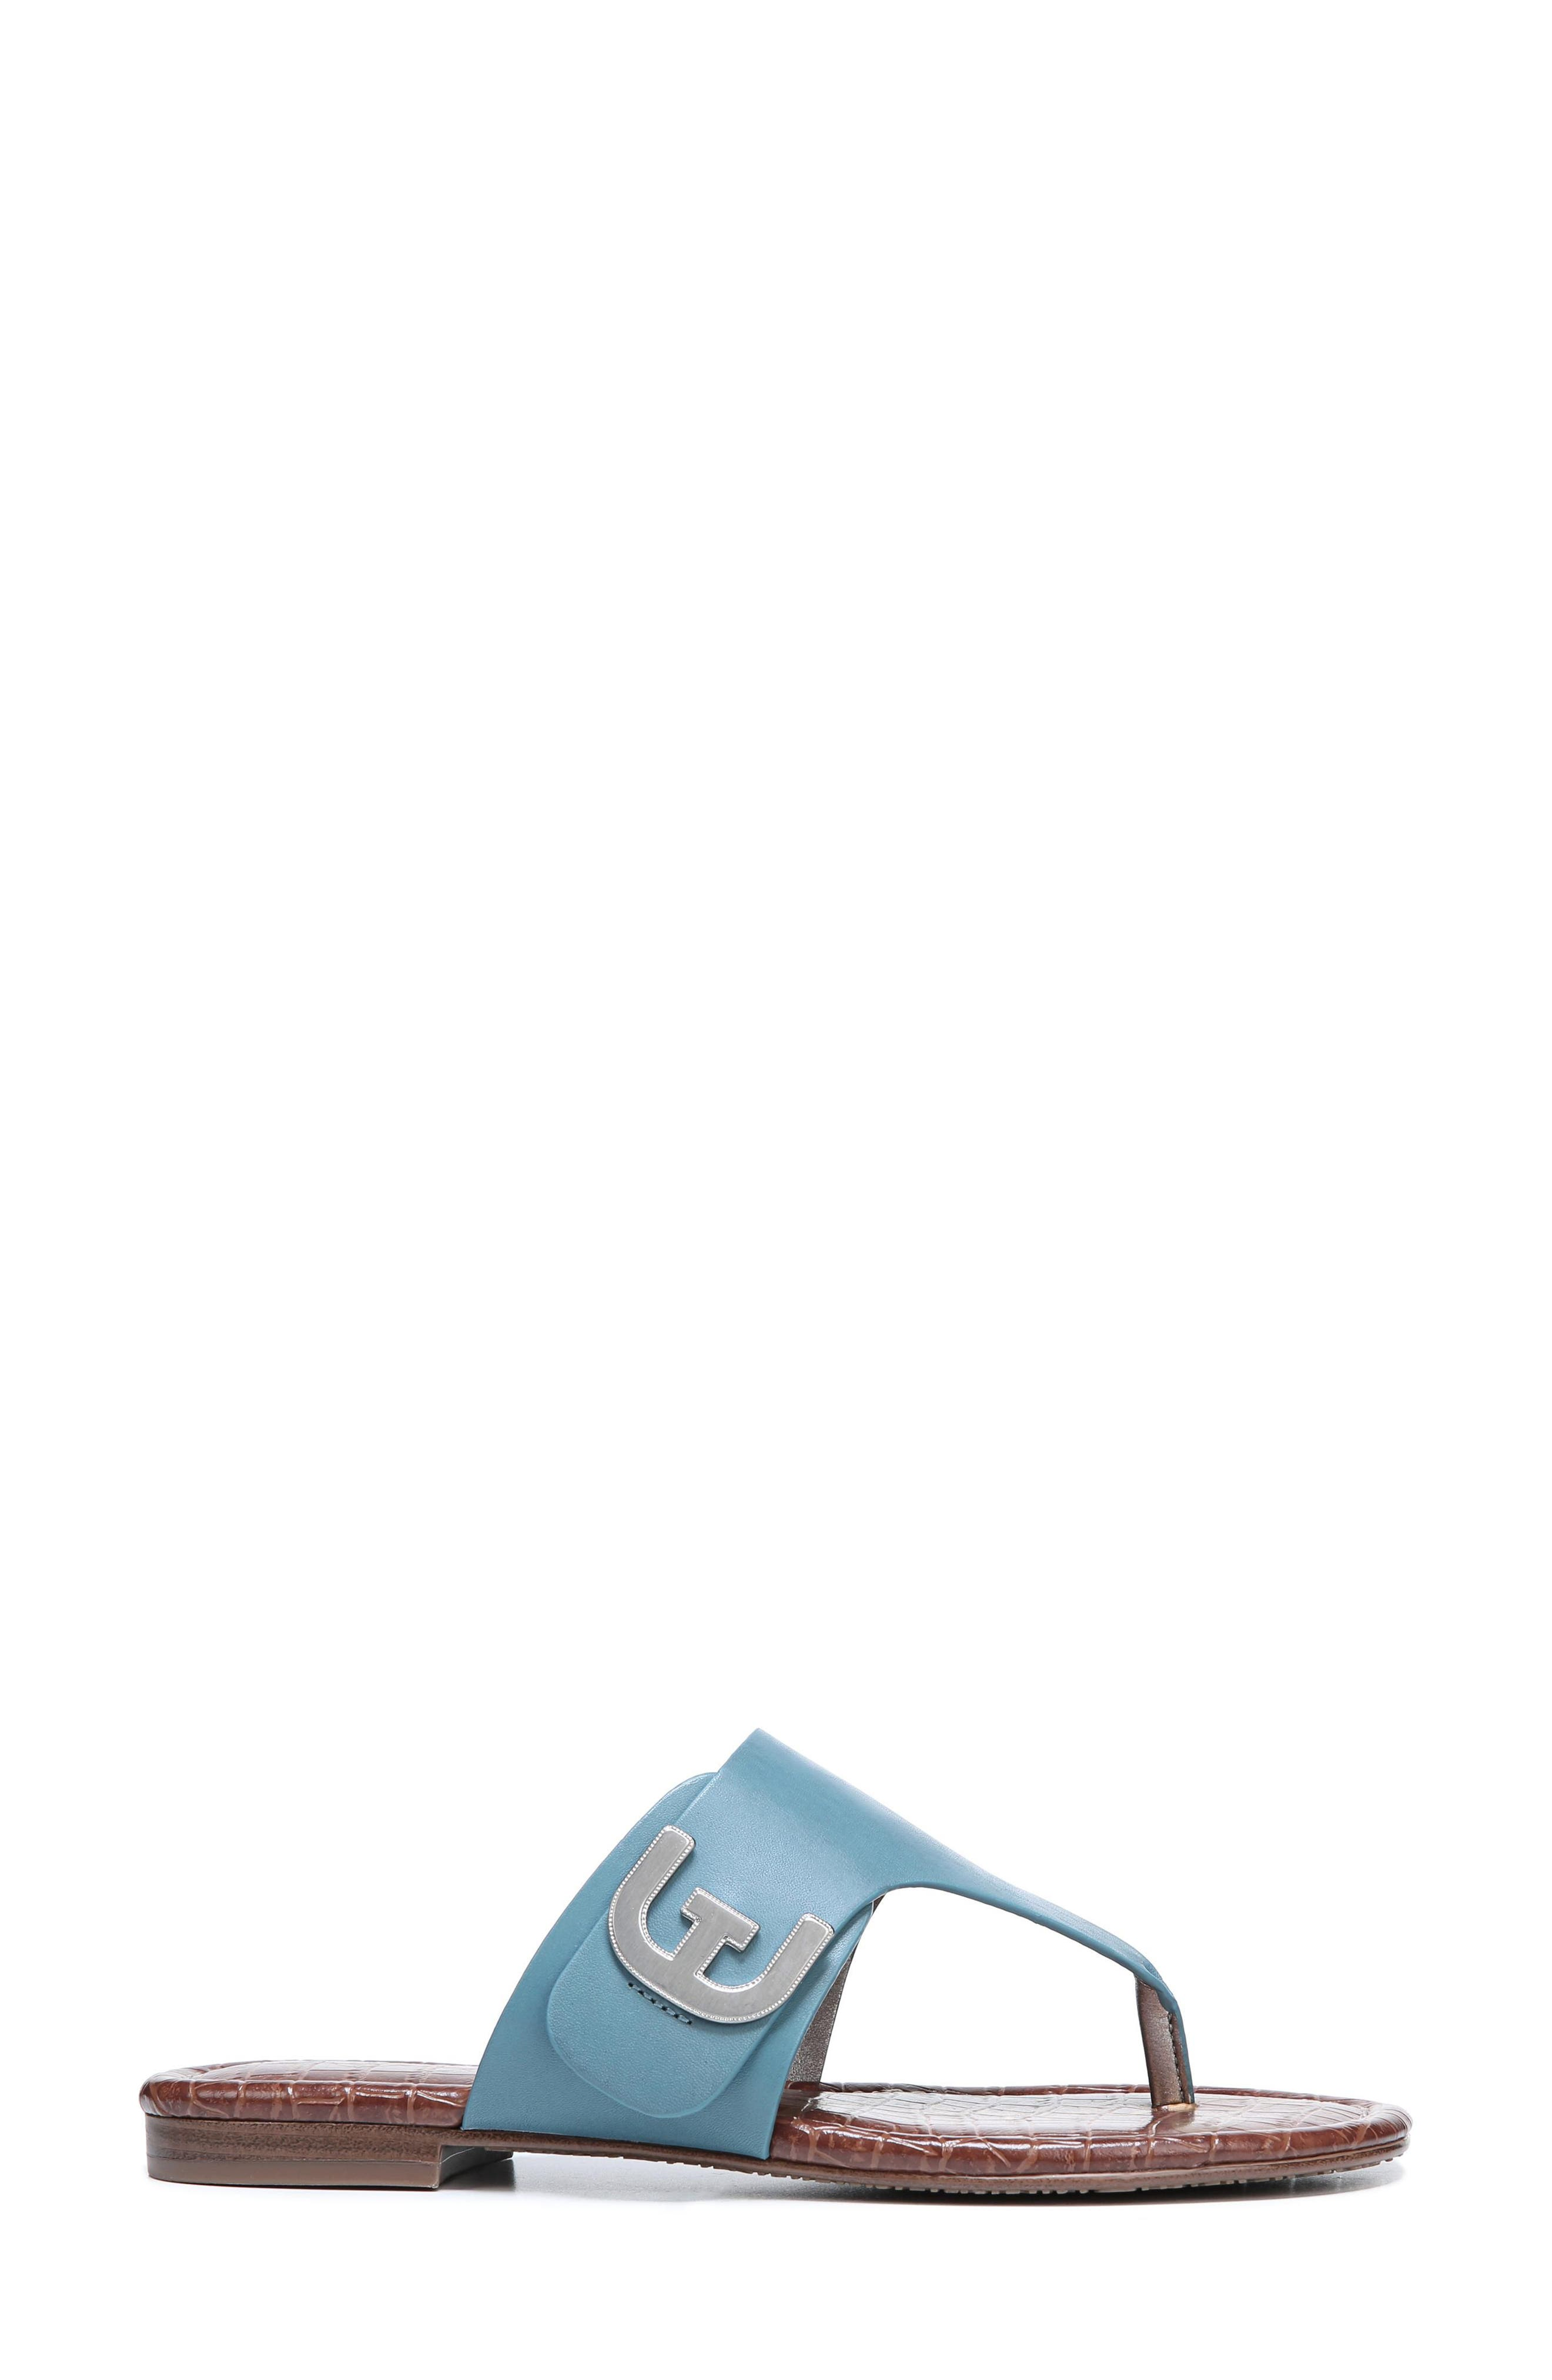 Barry V-Strap Thong Sandal,                             Alternate thumbnail 3, color,                             Denim Blue Leather